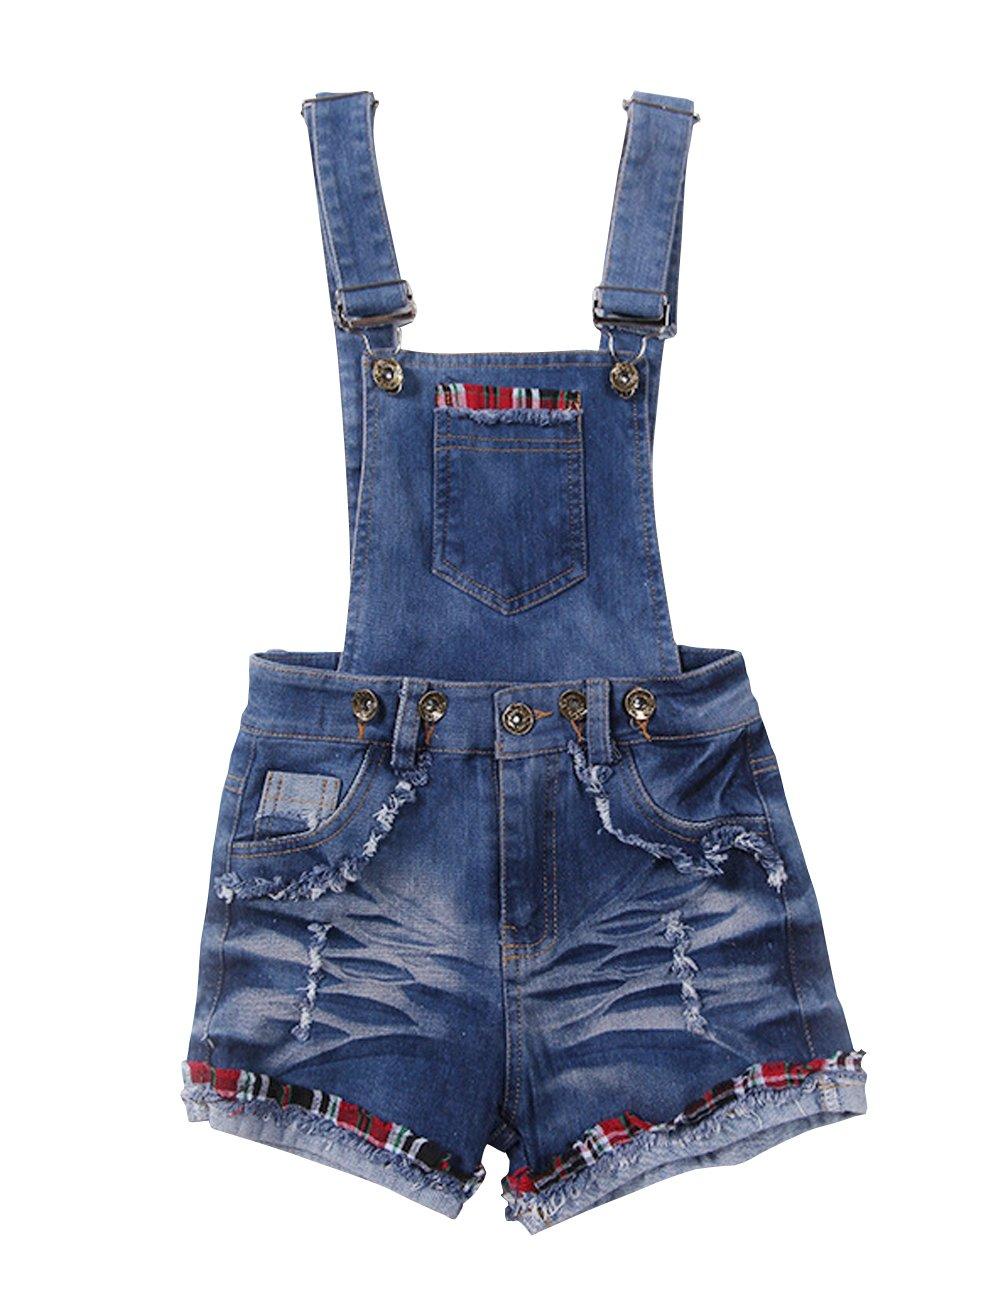 YJ.GWL Little Girls Clothes Denim Overalls Summer Jeans Shorts(Blue,120)